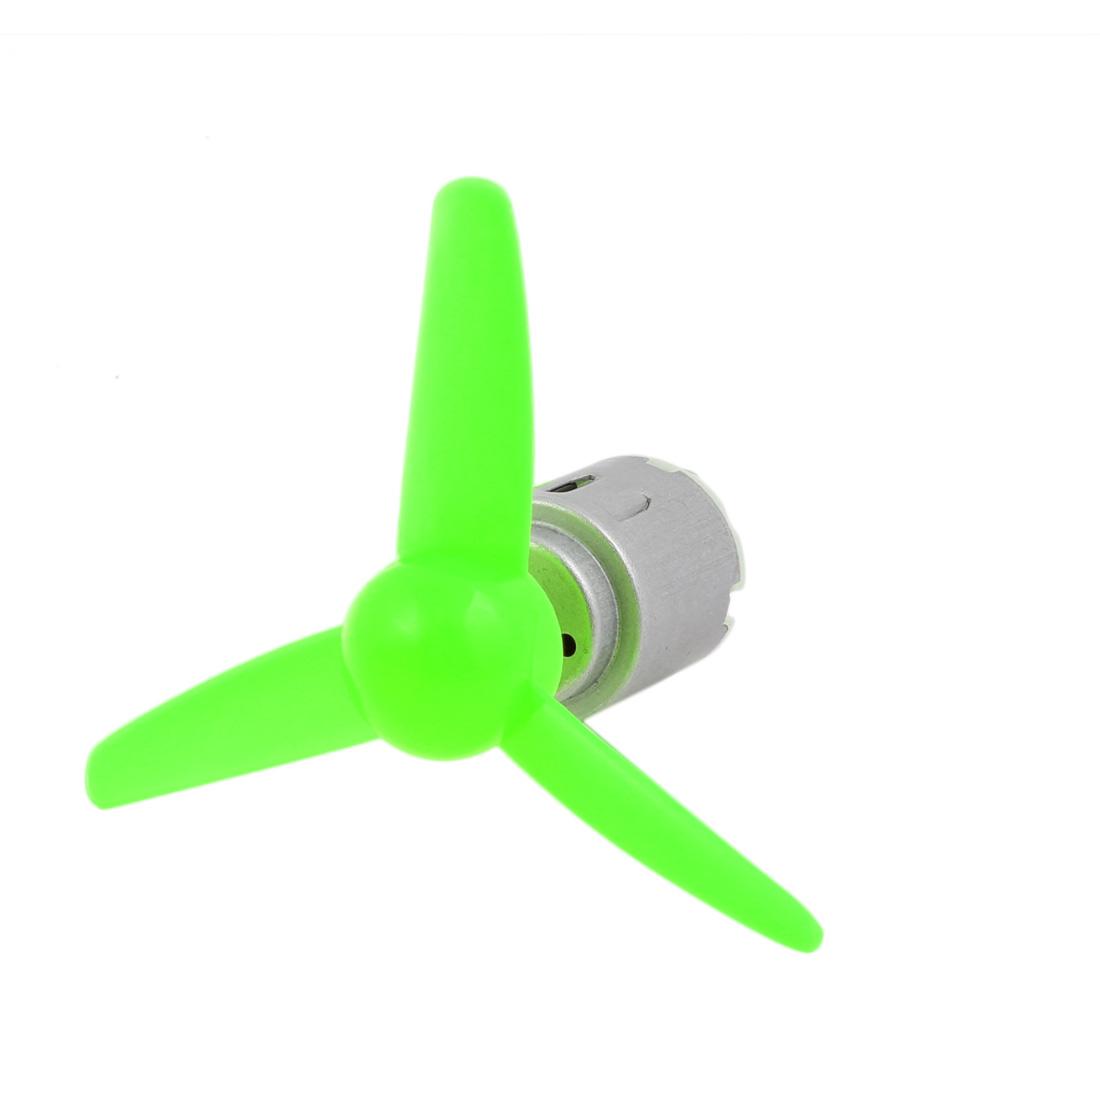 5 Pcs DC 6.0V 0.13A 5000RPM Motor 80mm 3-Vanes Pointed Propeller Green - image 5 de 6